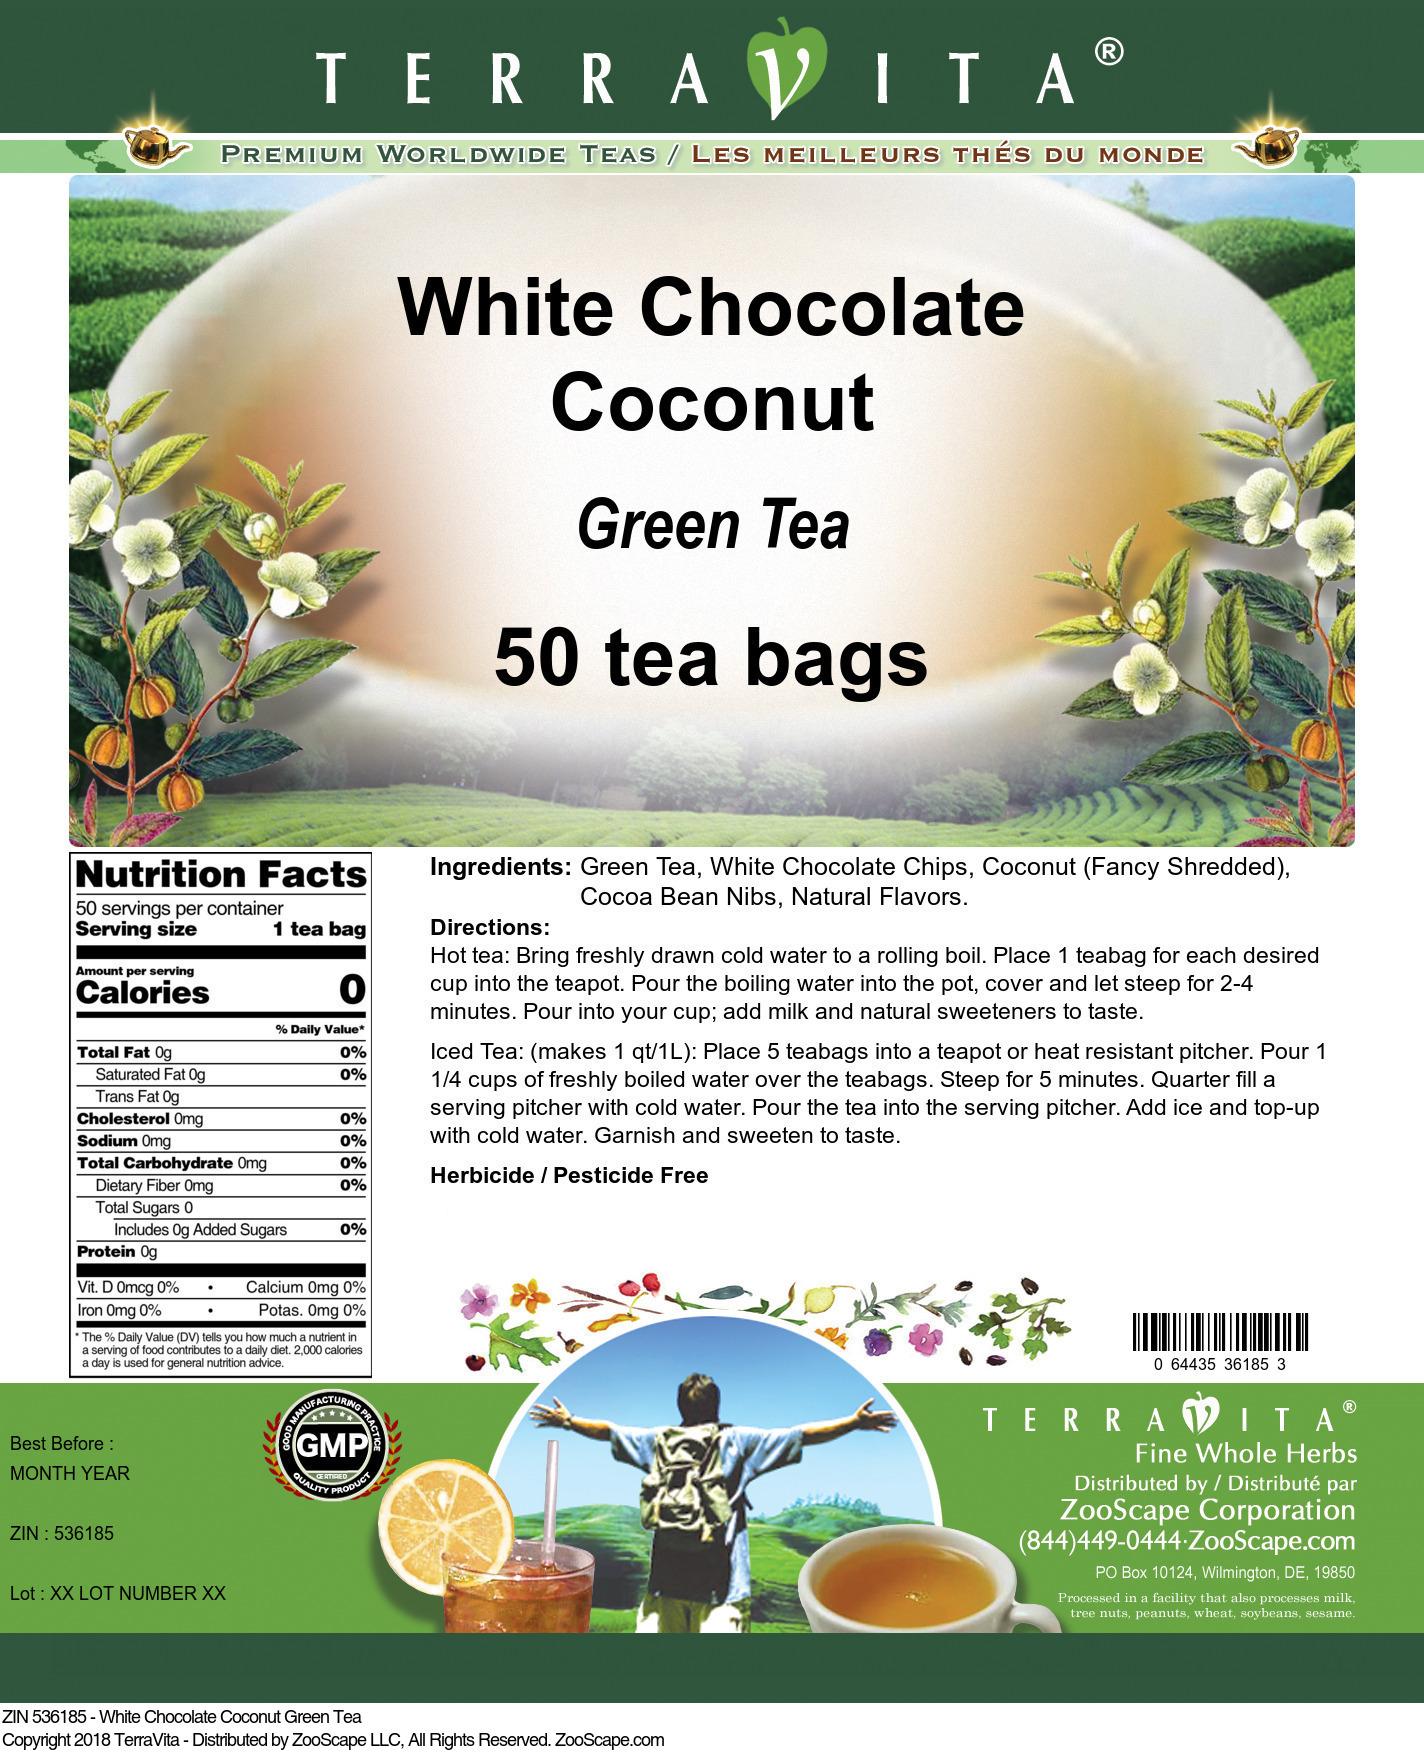 White Chocolate Coconut Green Tea